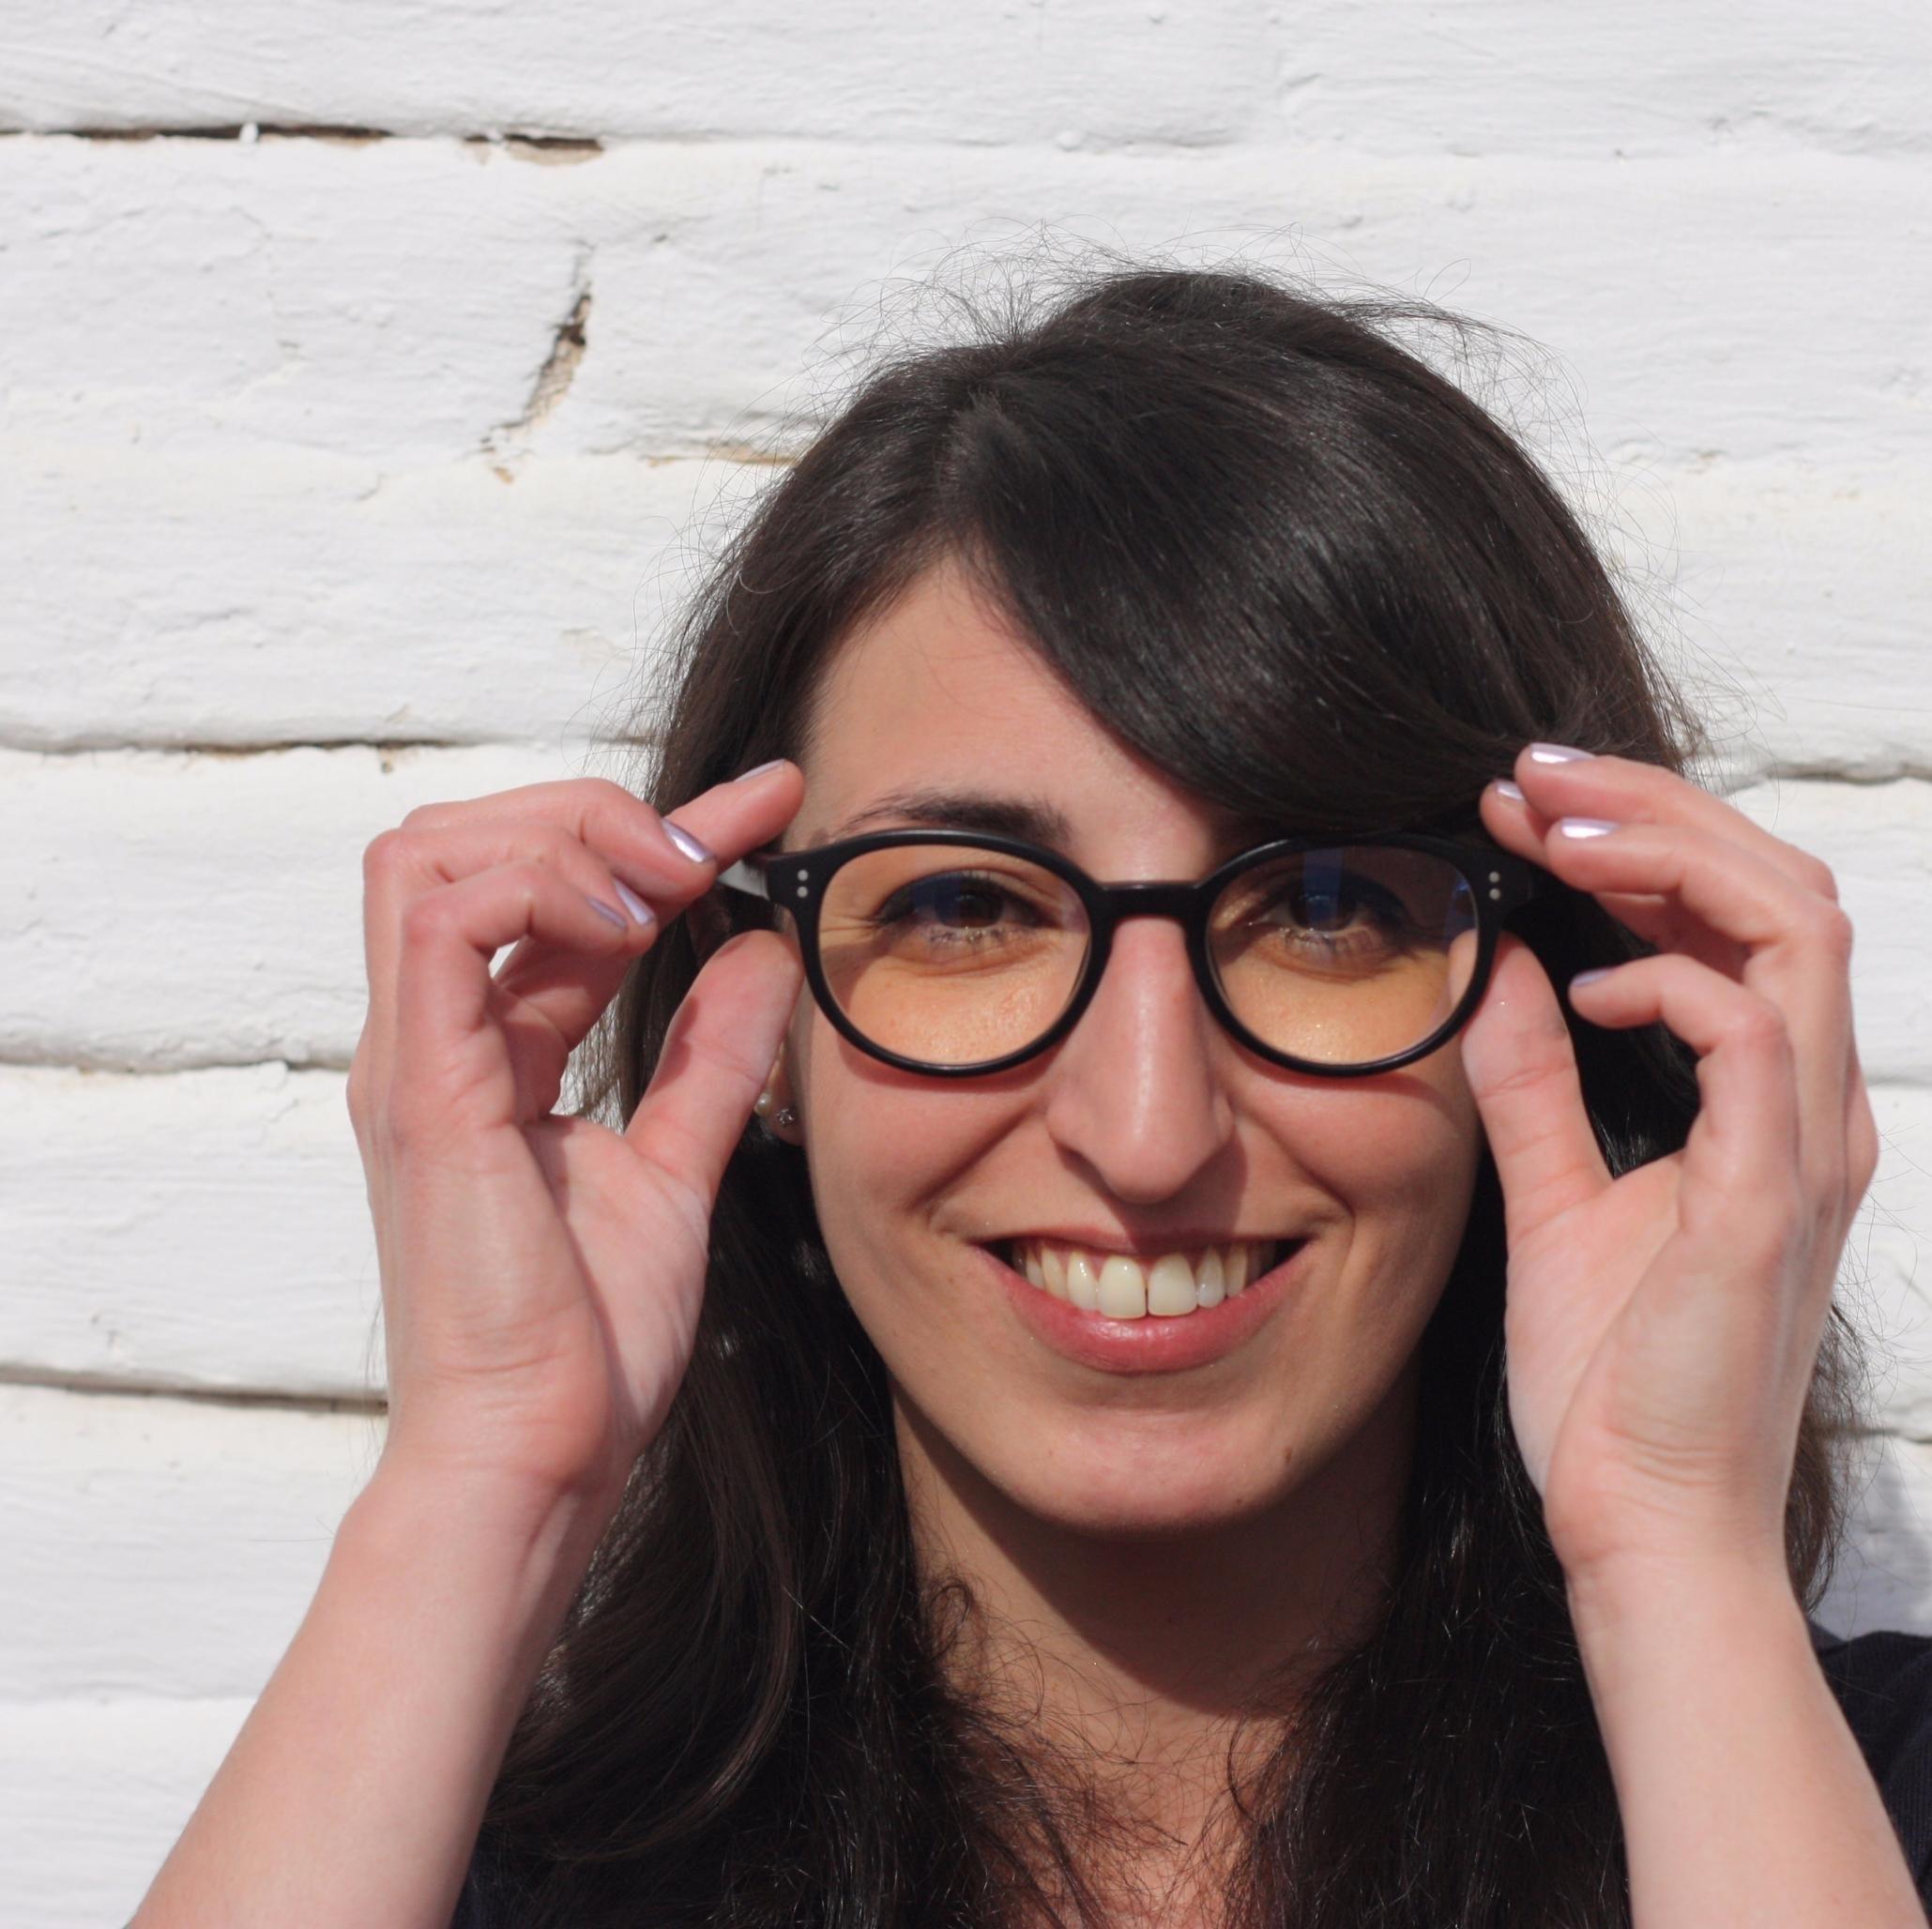 Giulia Motteran